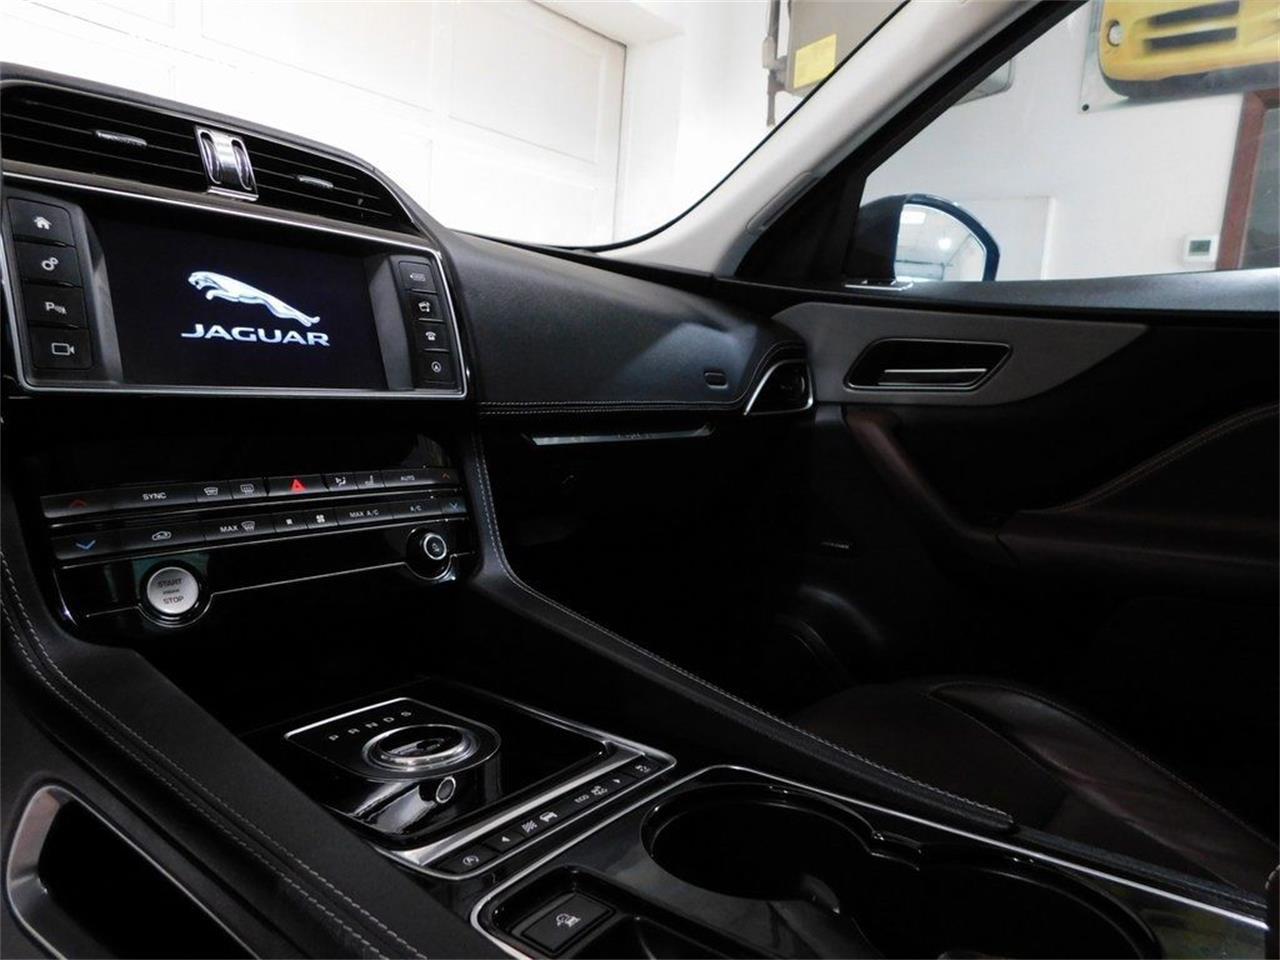 2017 Jaguar F-PACE (CC-1418146) for sale in Hamburg, New York